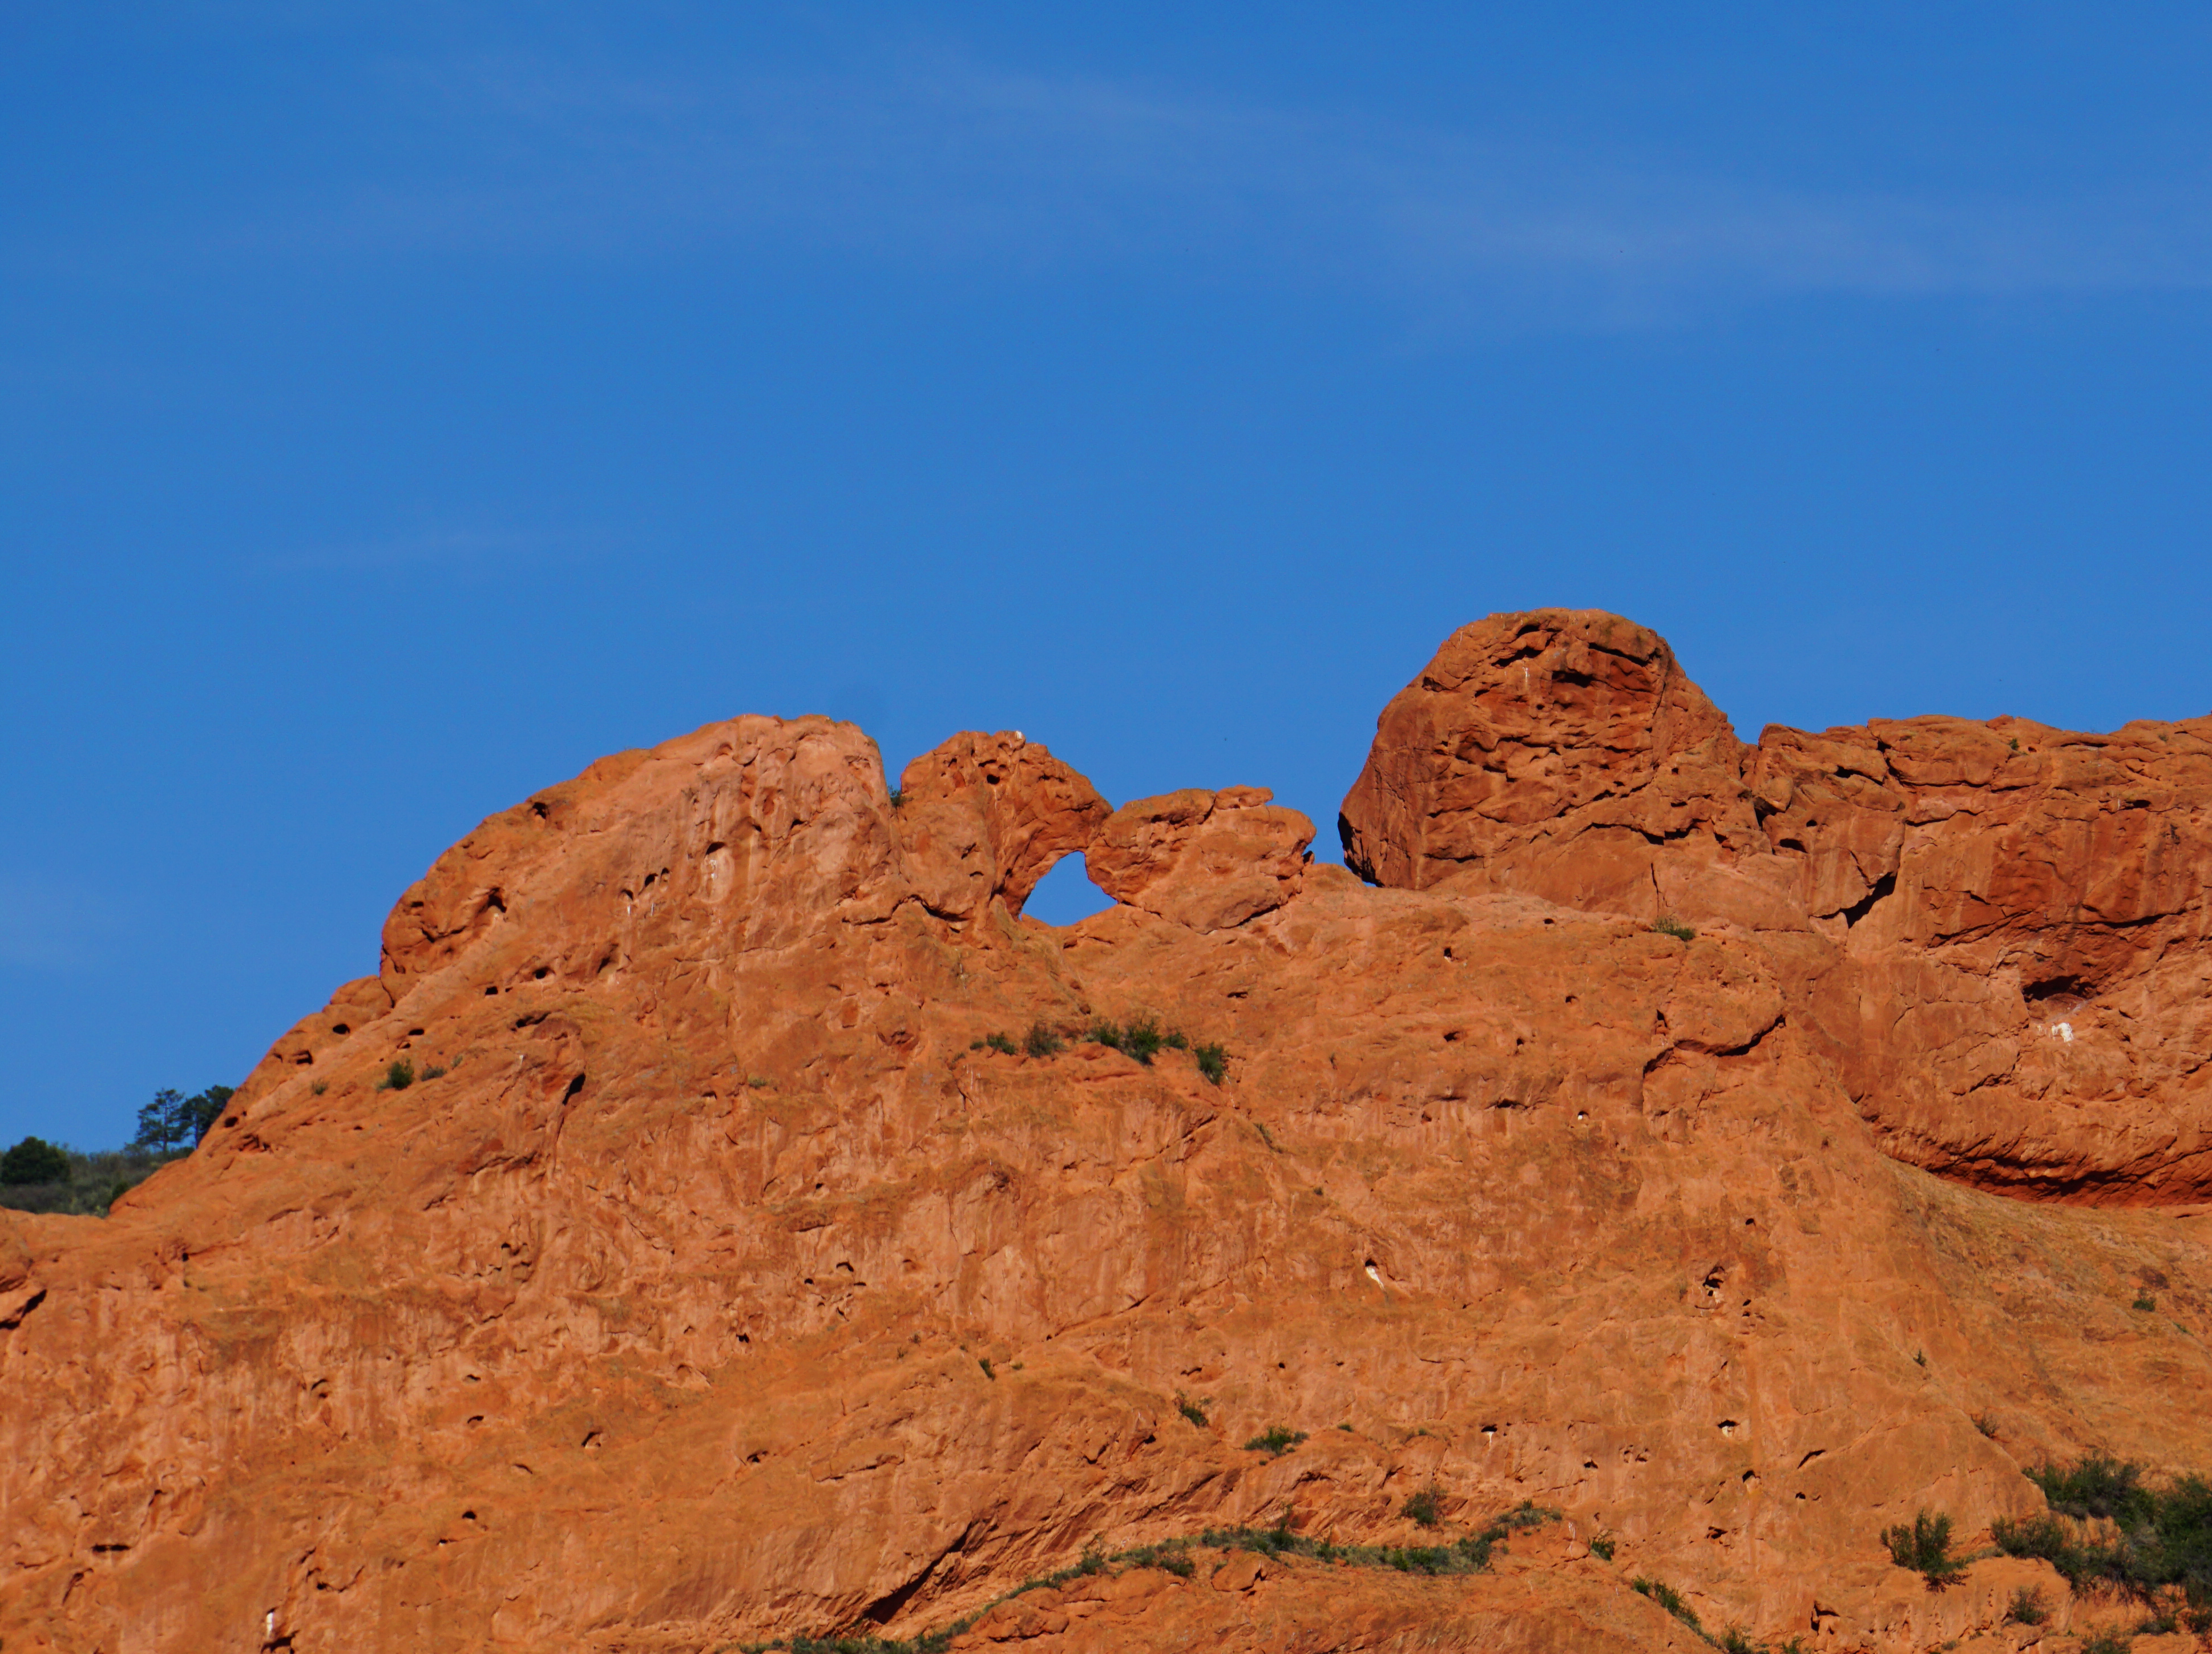 Kissing Camels Garden of the Gods Colorado Springs